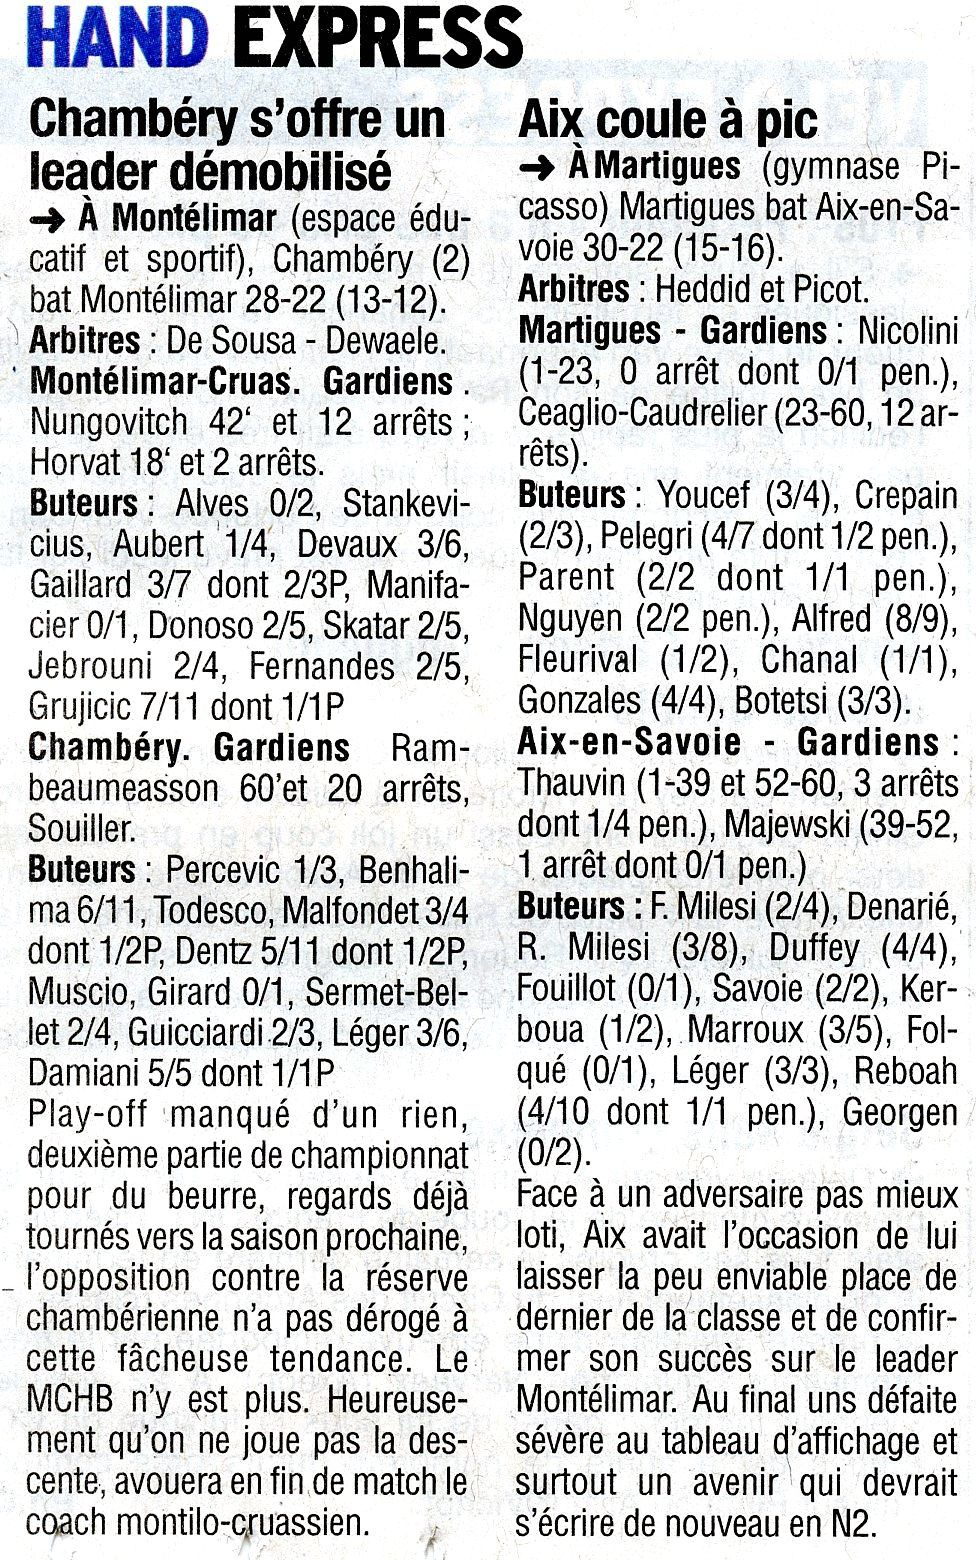 N1 : Montélimar / Chambéry : 22-28  samedi 8 avril 2017